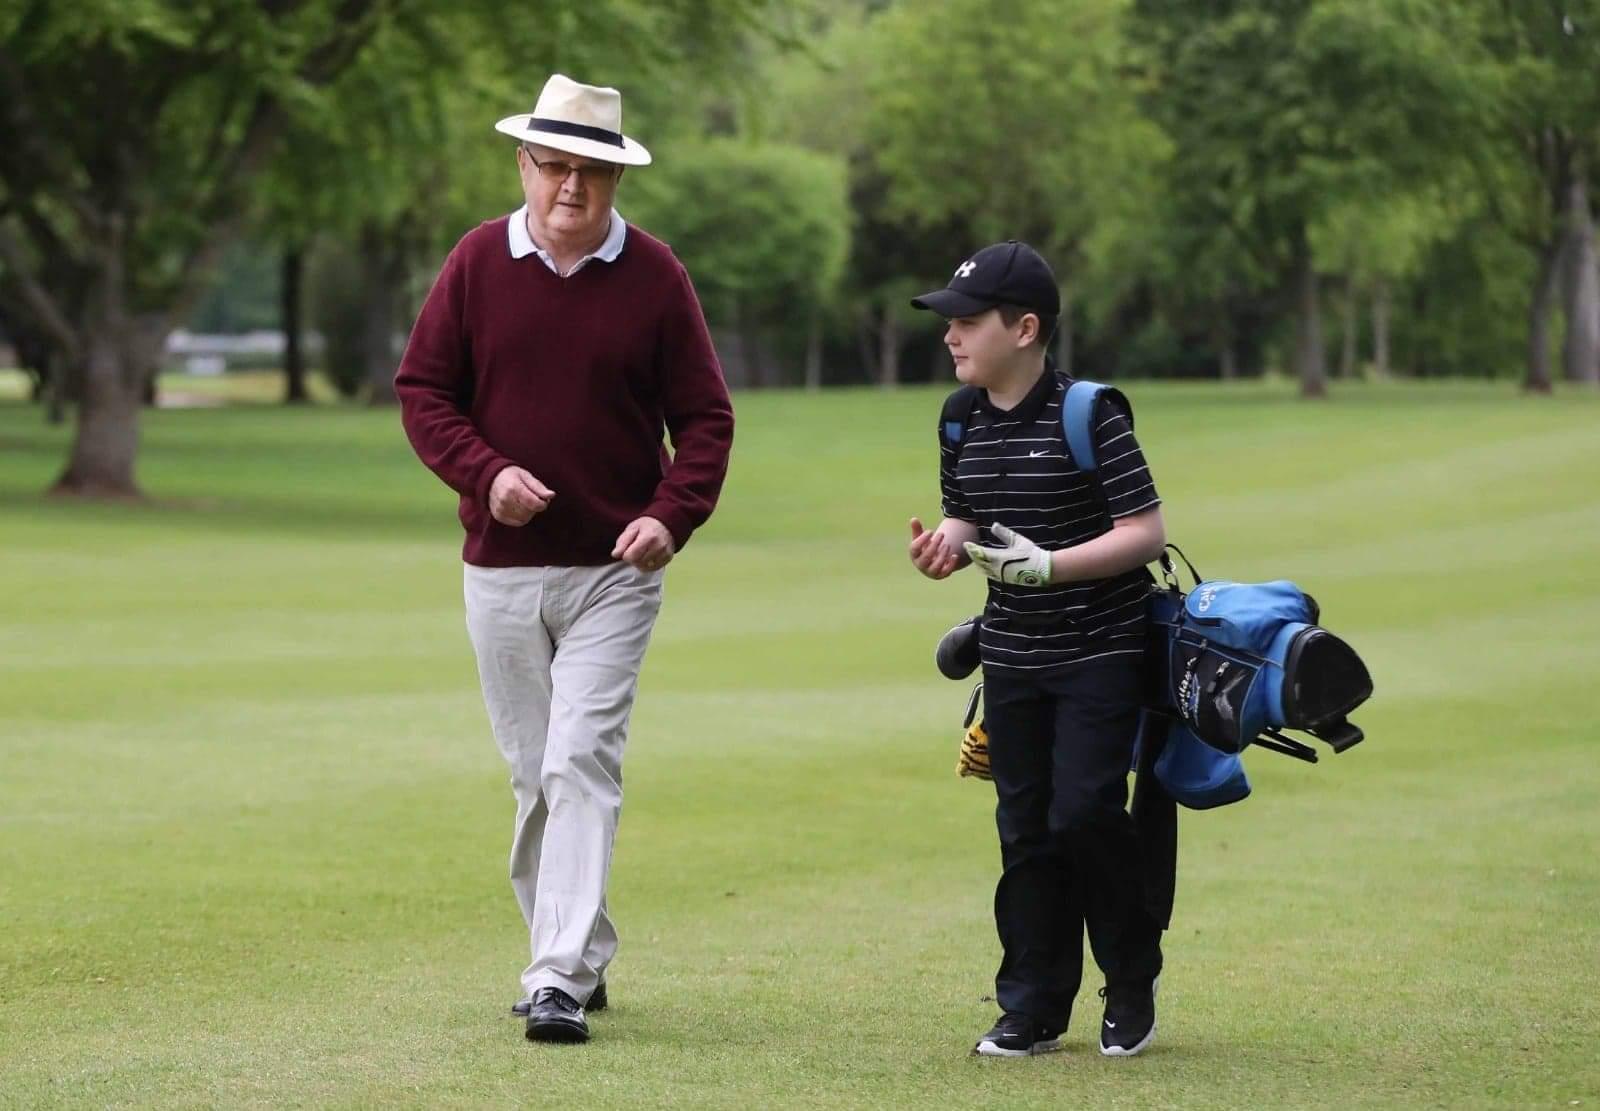 Aaron and his granddad kevin